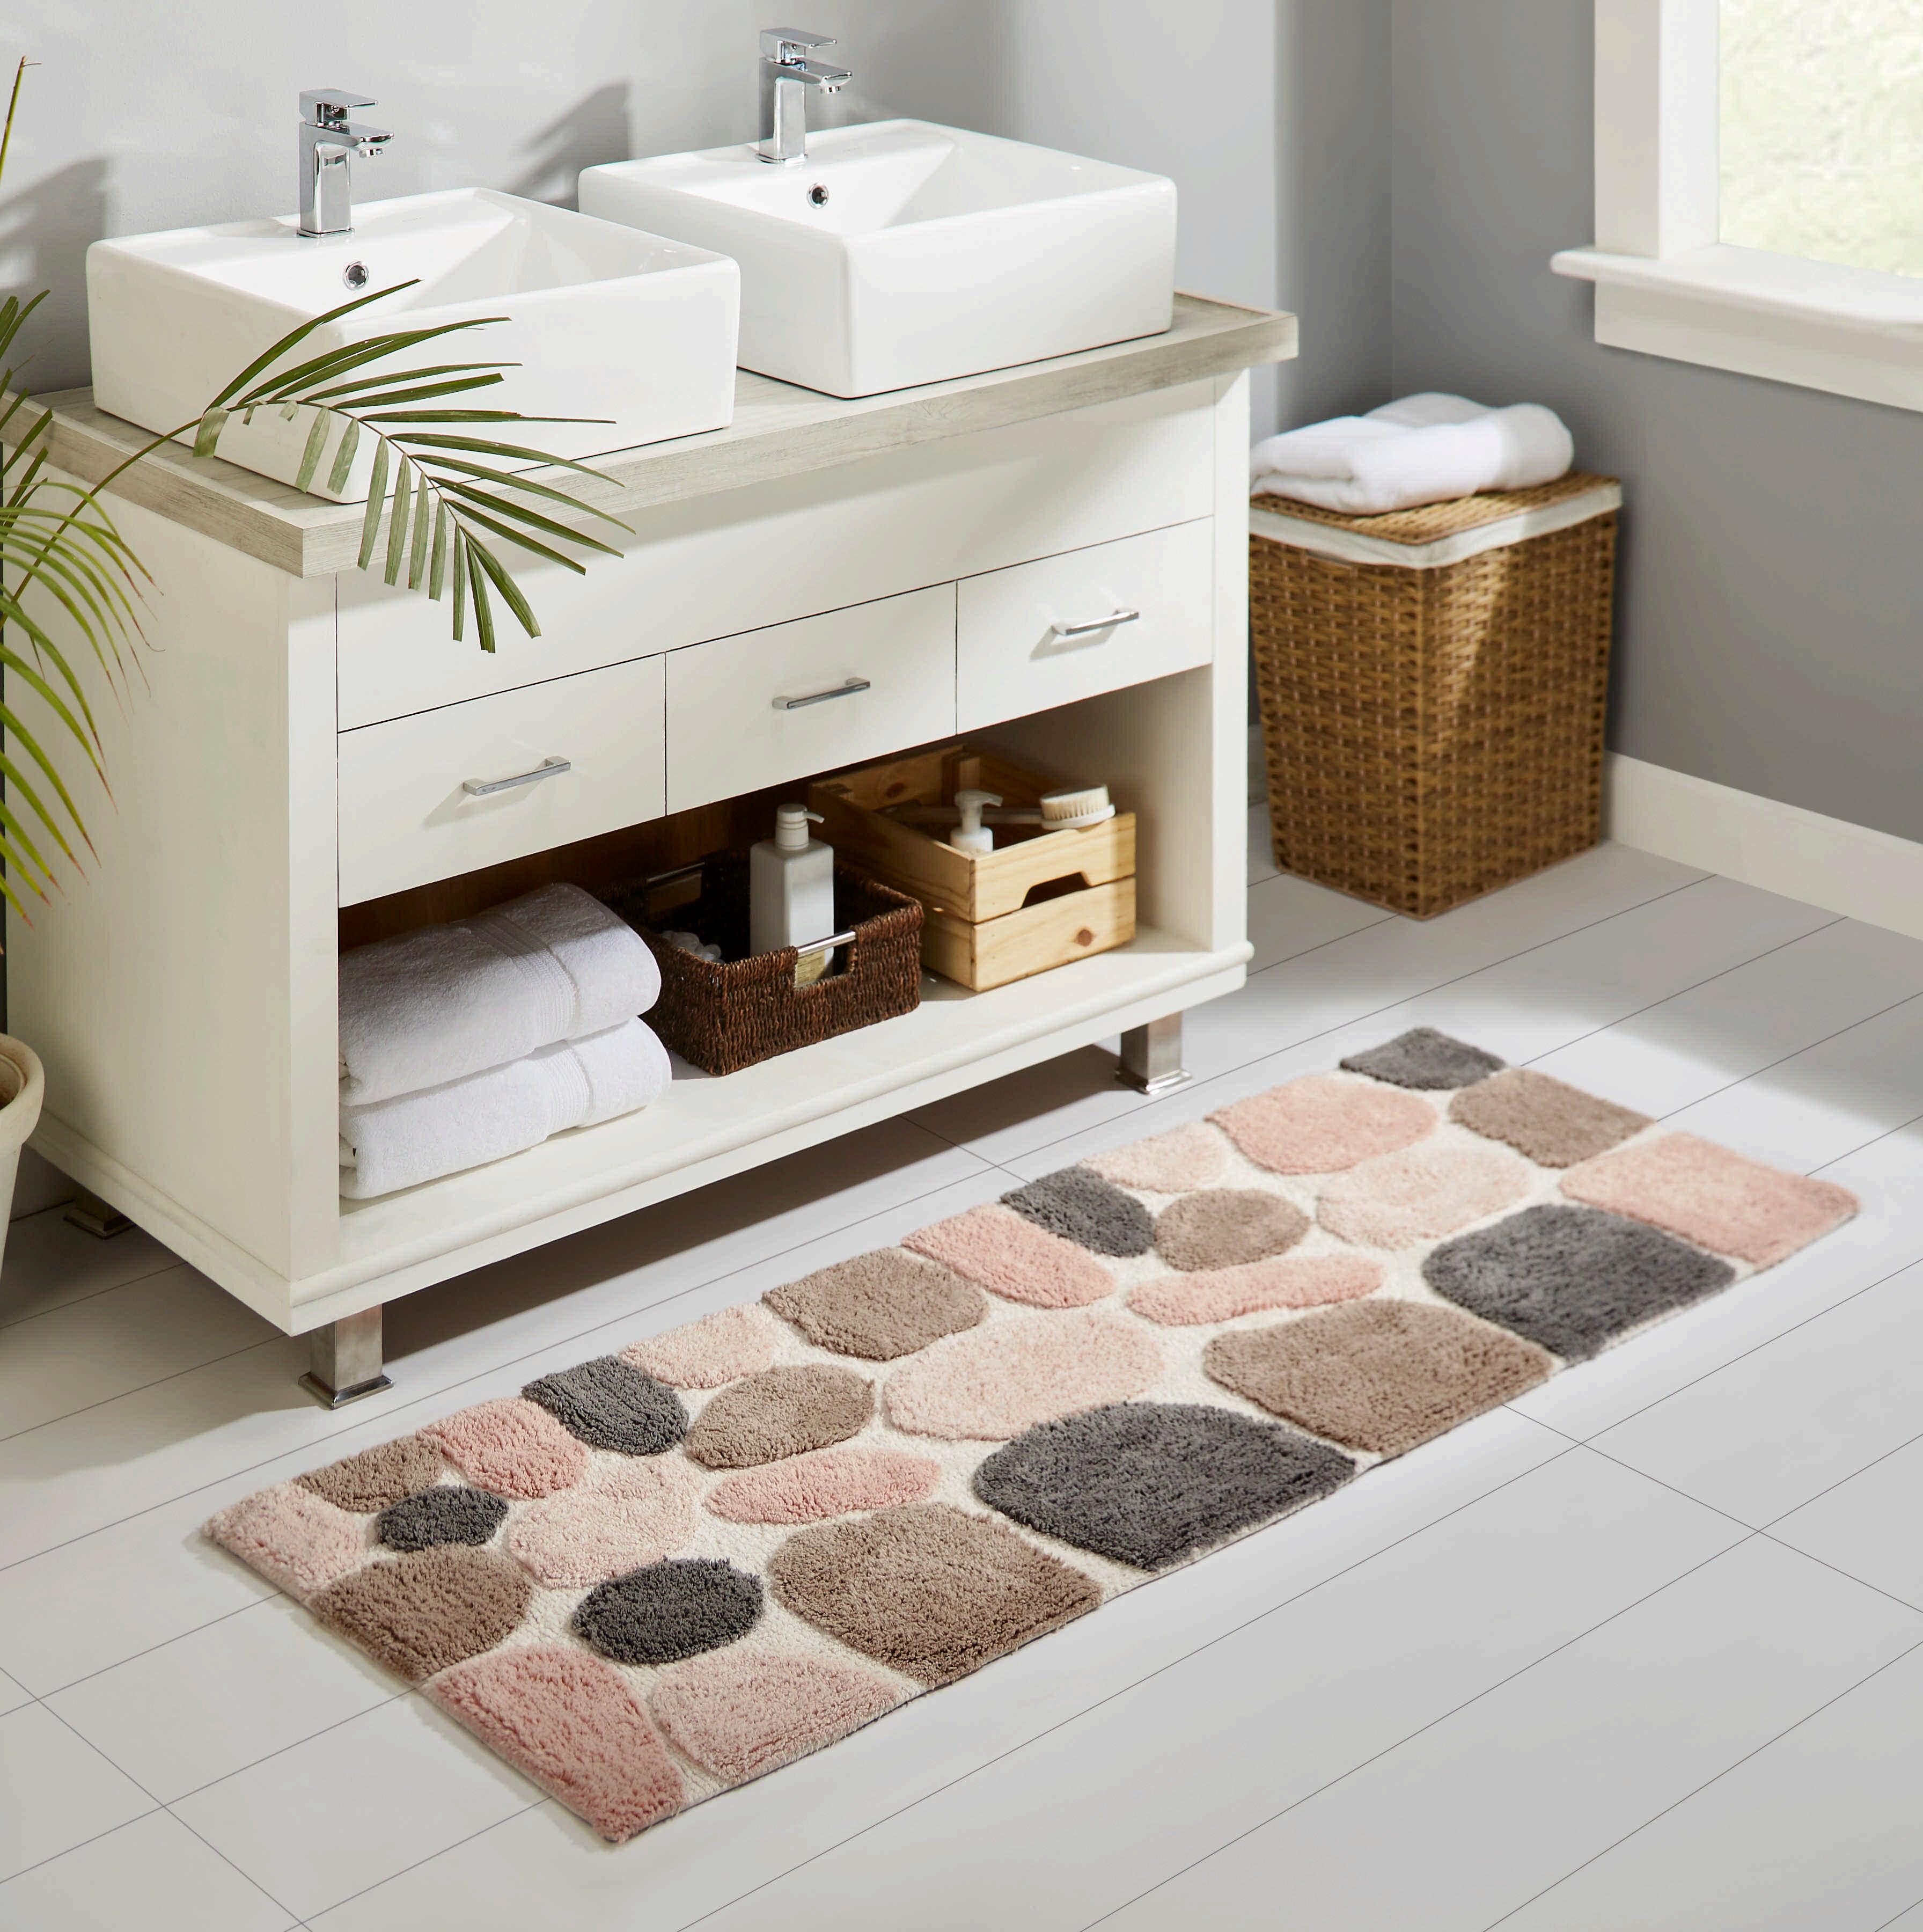 Pink Bath Rugs Mats Bathrooms You Ll Love In 2021 Wayfair